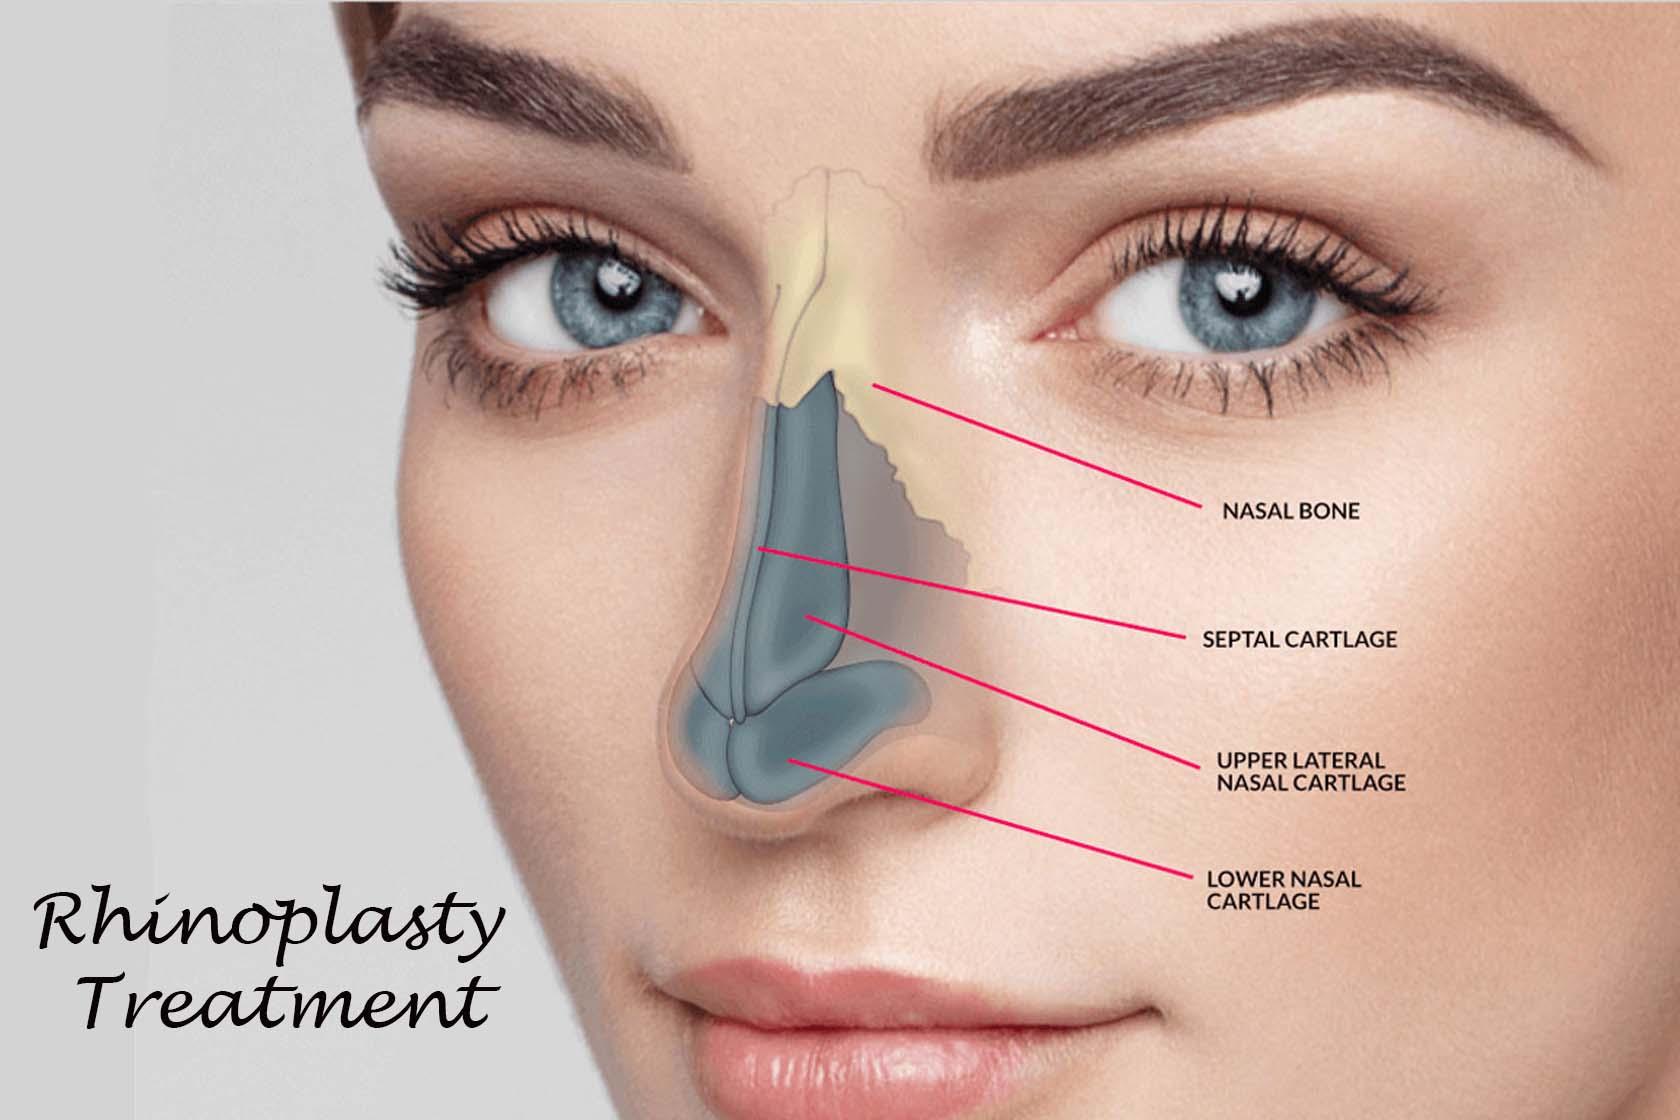 Rhinoplasty Treatment